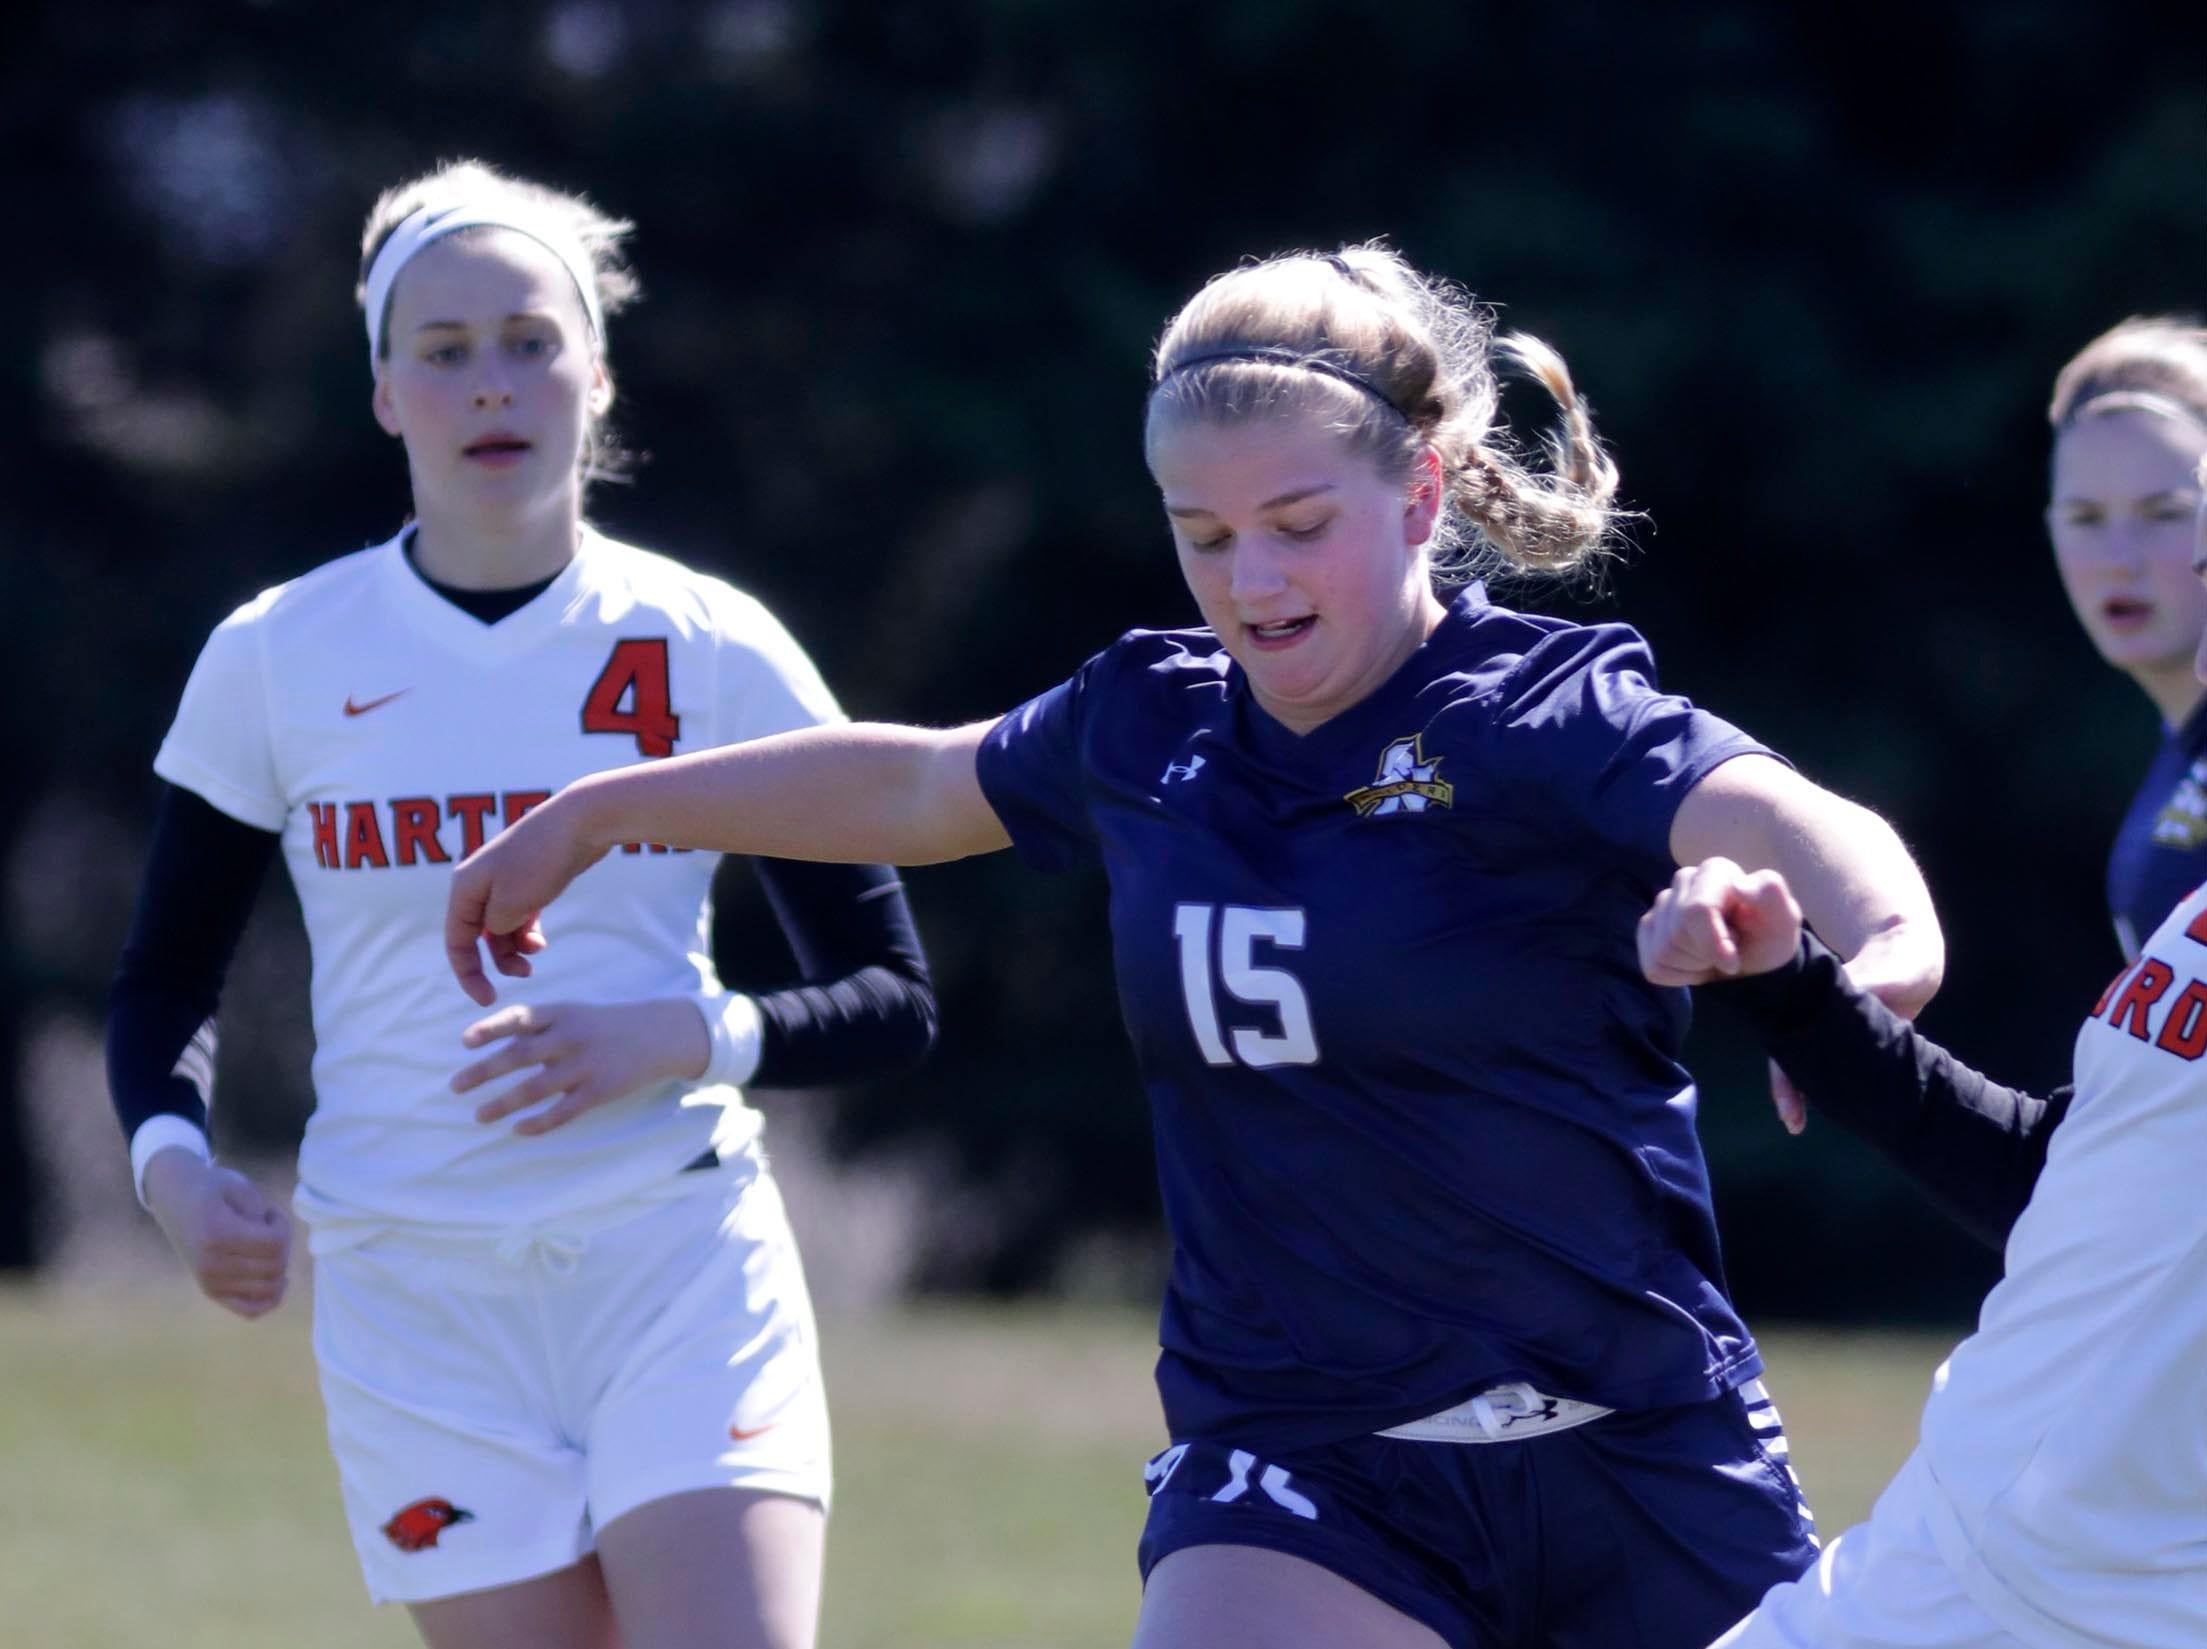 Sheboygan North's Lizzie Revelis (15) moves the ball against Hartford, at the Sheboygan South Soccer tournament, Saturday, April 20, 2019, in Sheboygan, Wis.